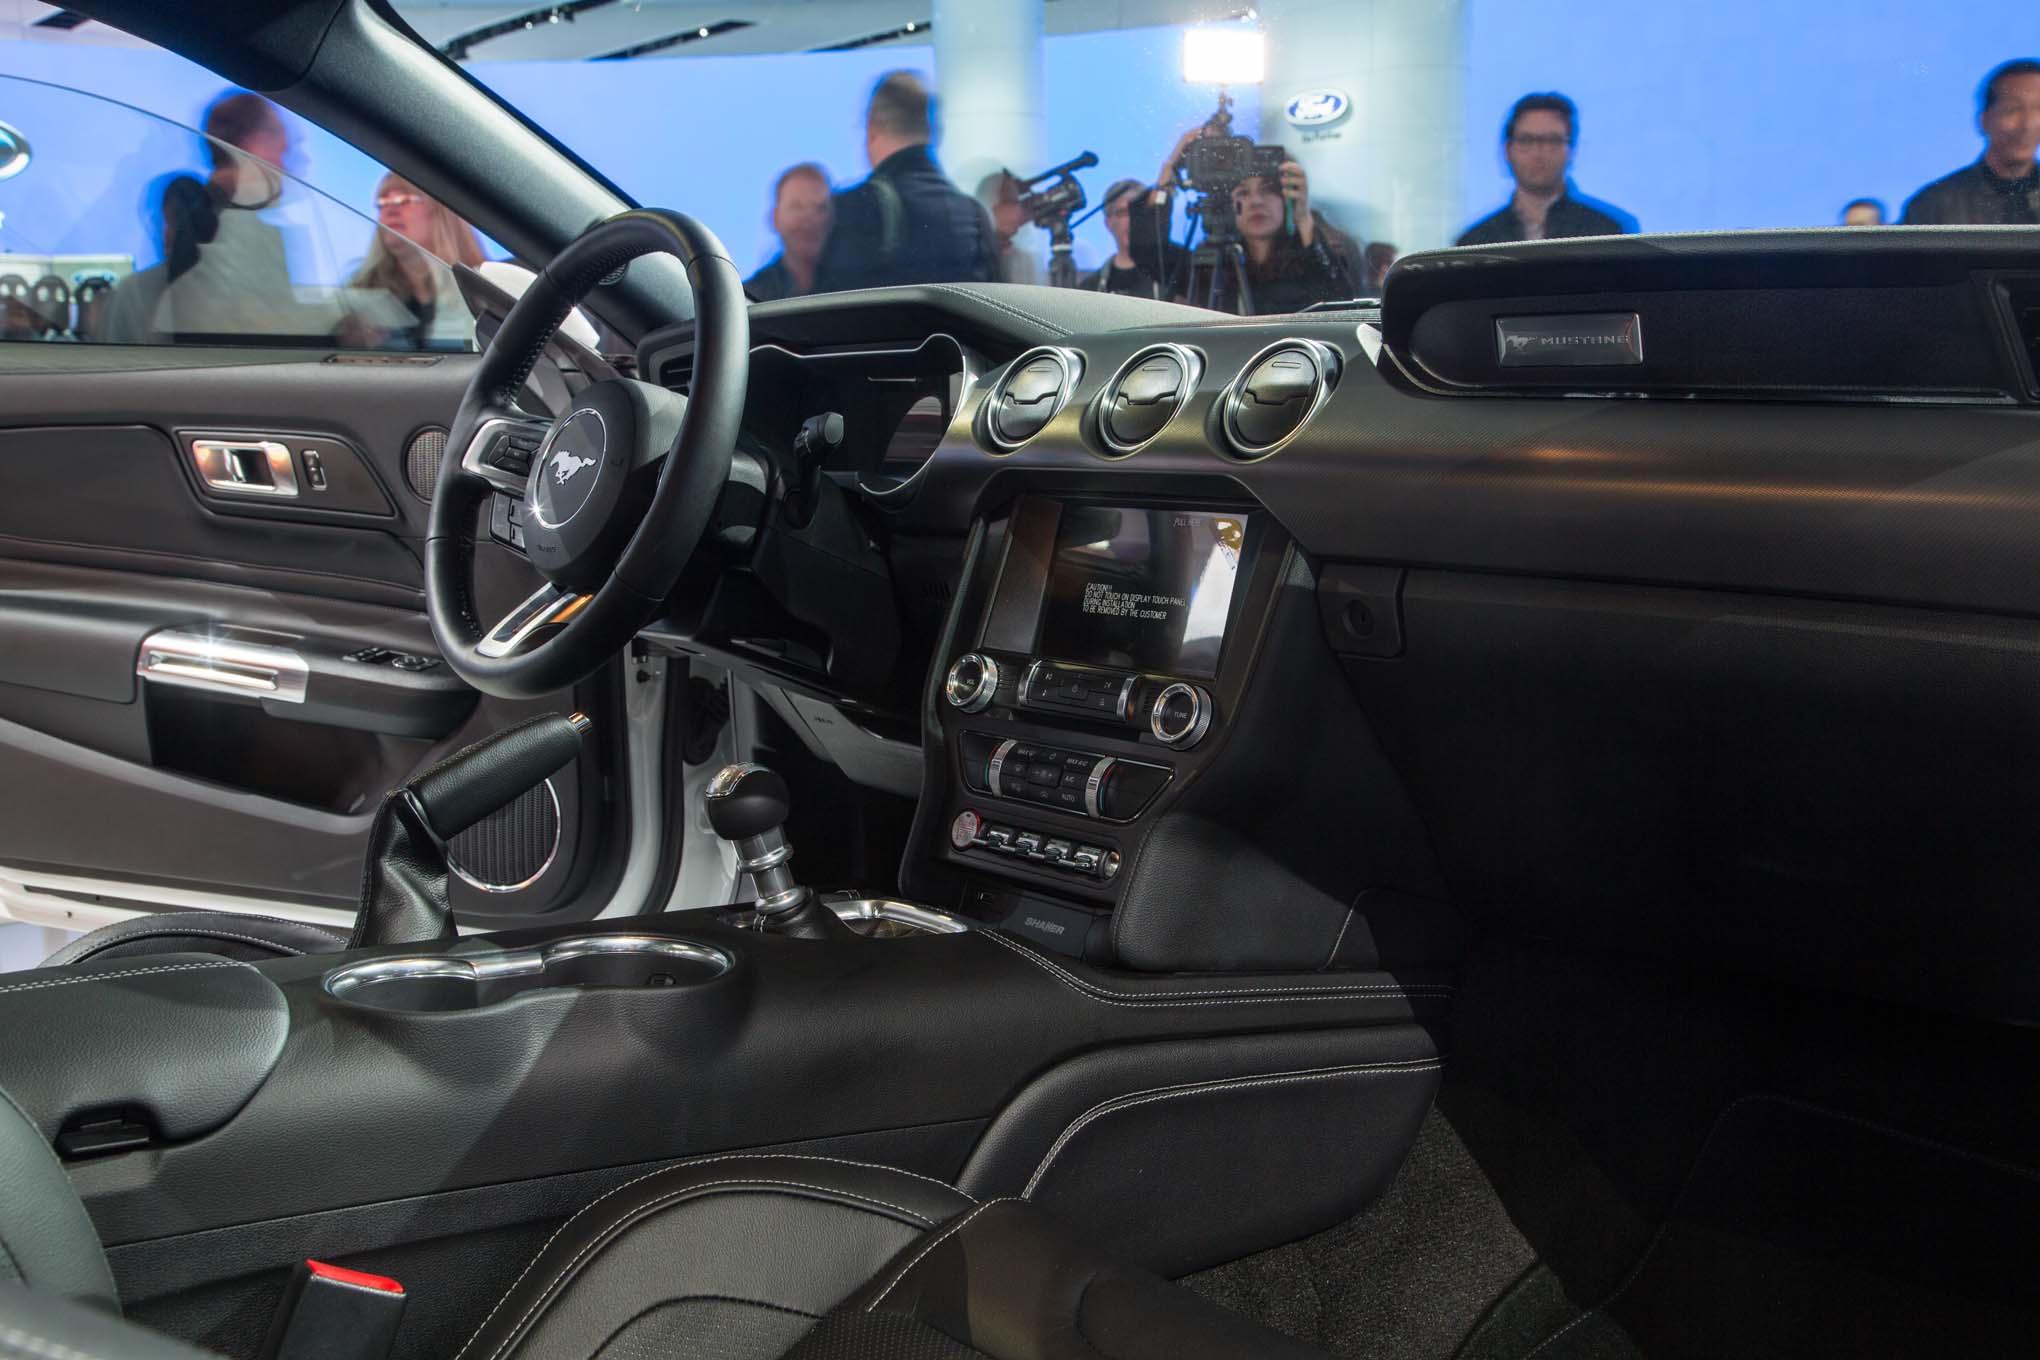 2018-Ford-Mustang-GT-interior-view-1 - Motor Trend en Español